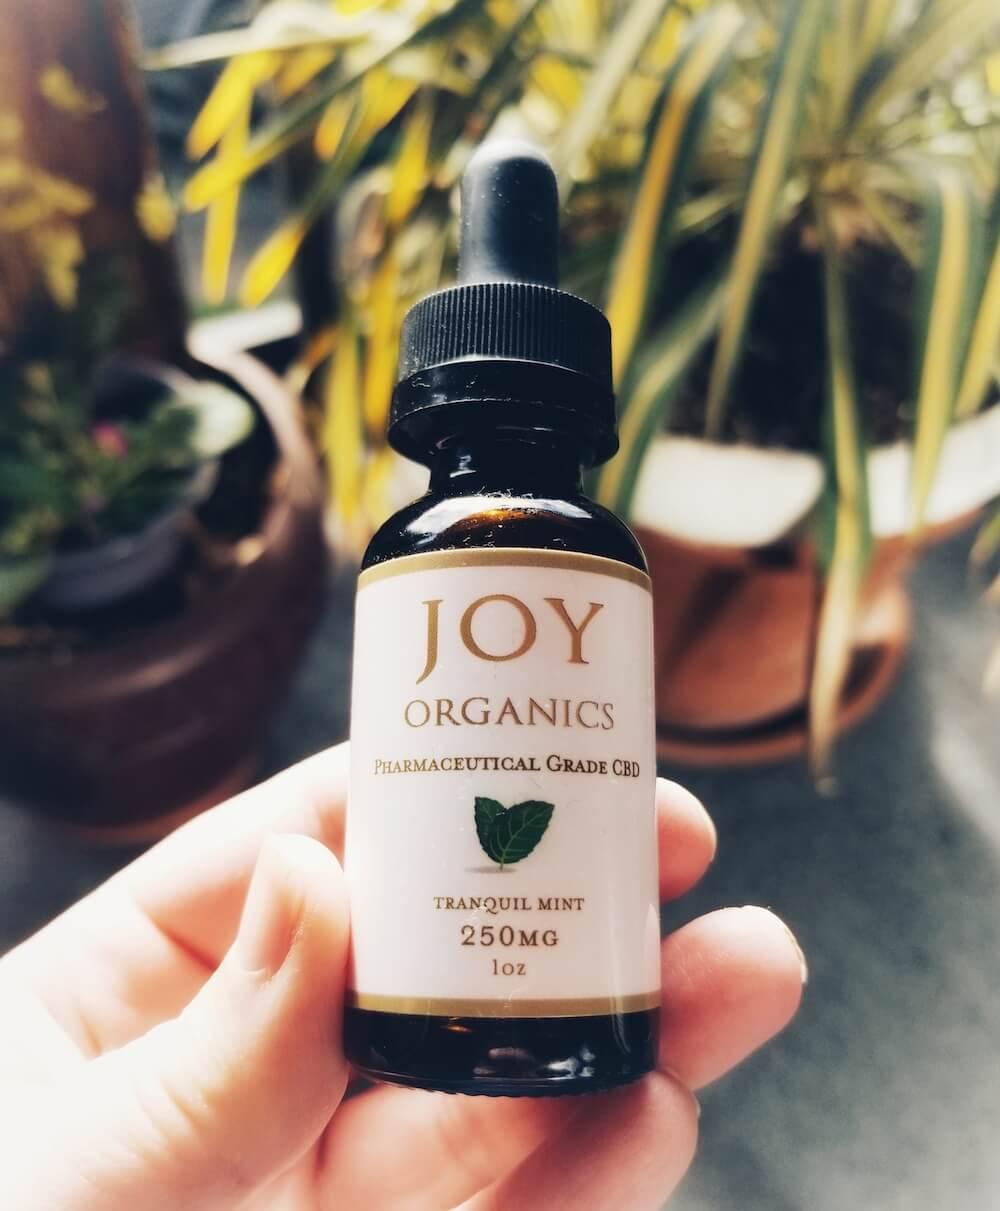 Joy Organics Full Spectrum Hemp CBD Oil Zero THC Tranquil Mint Flavor